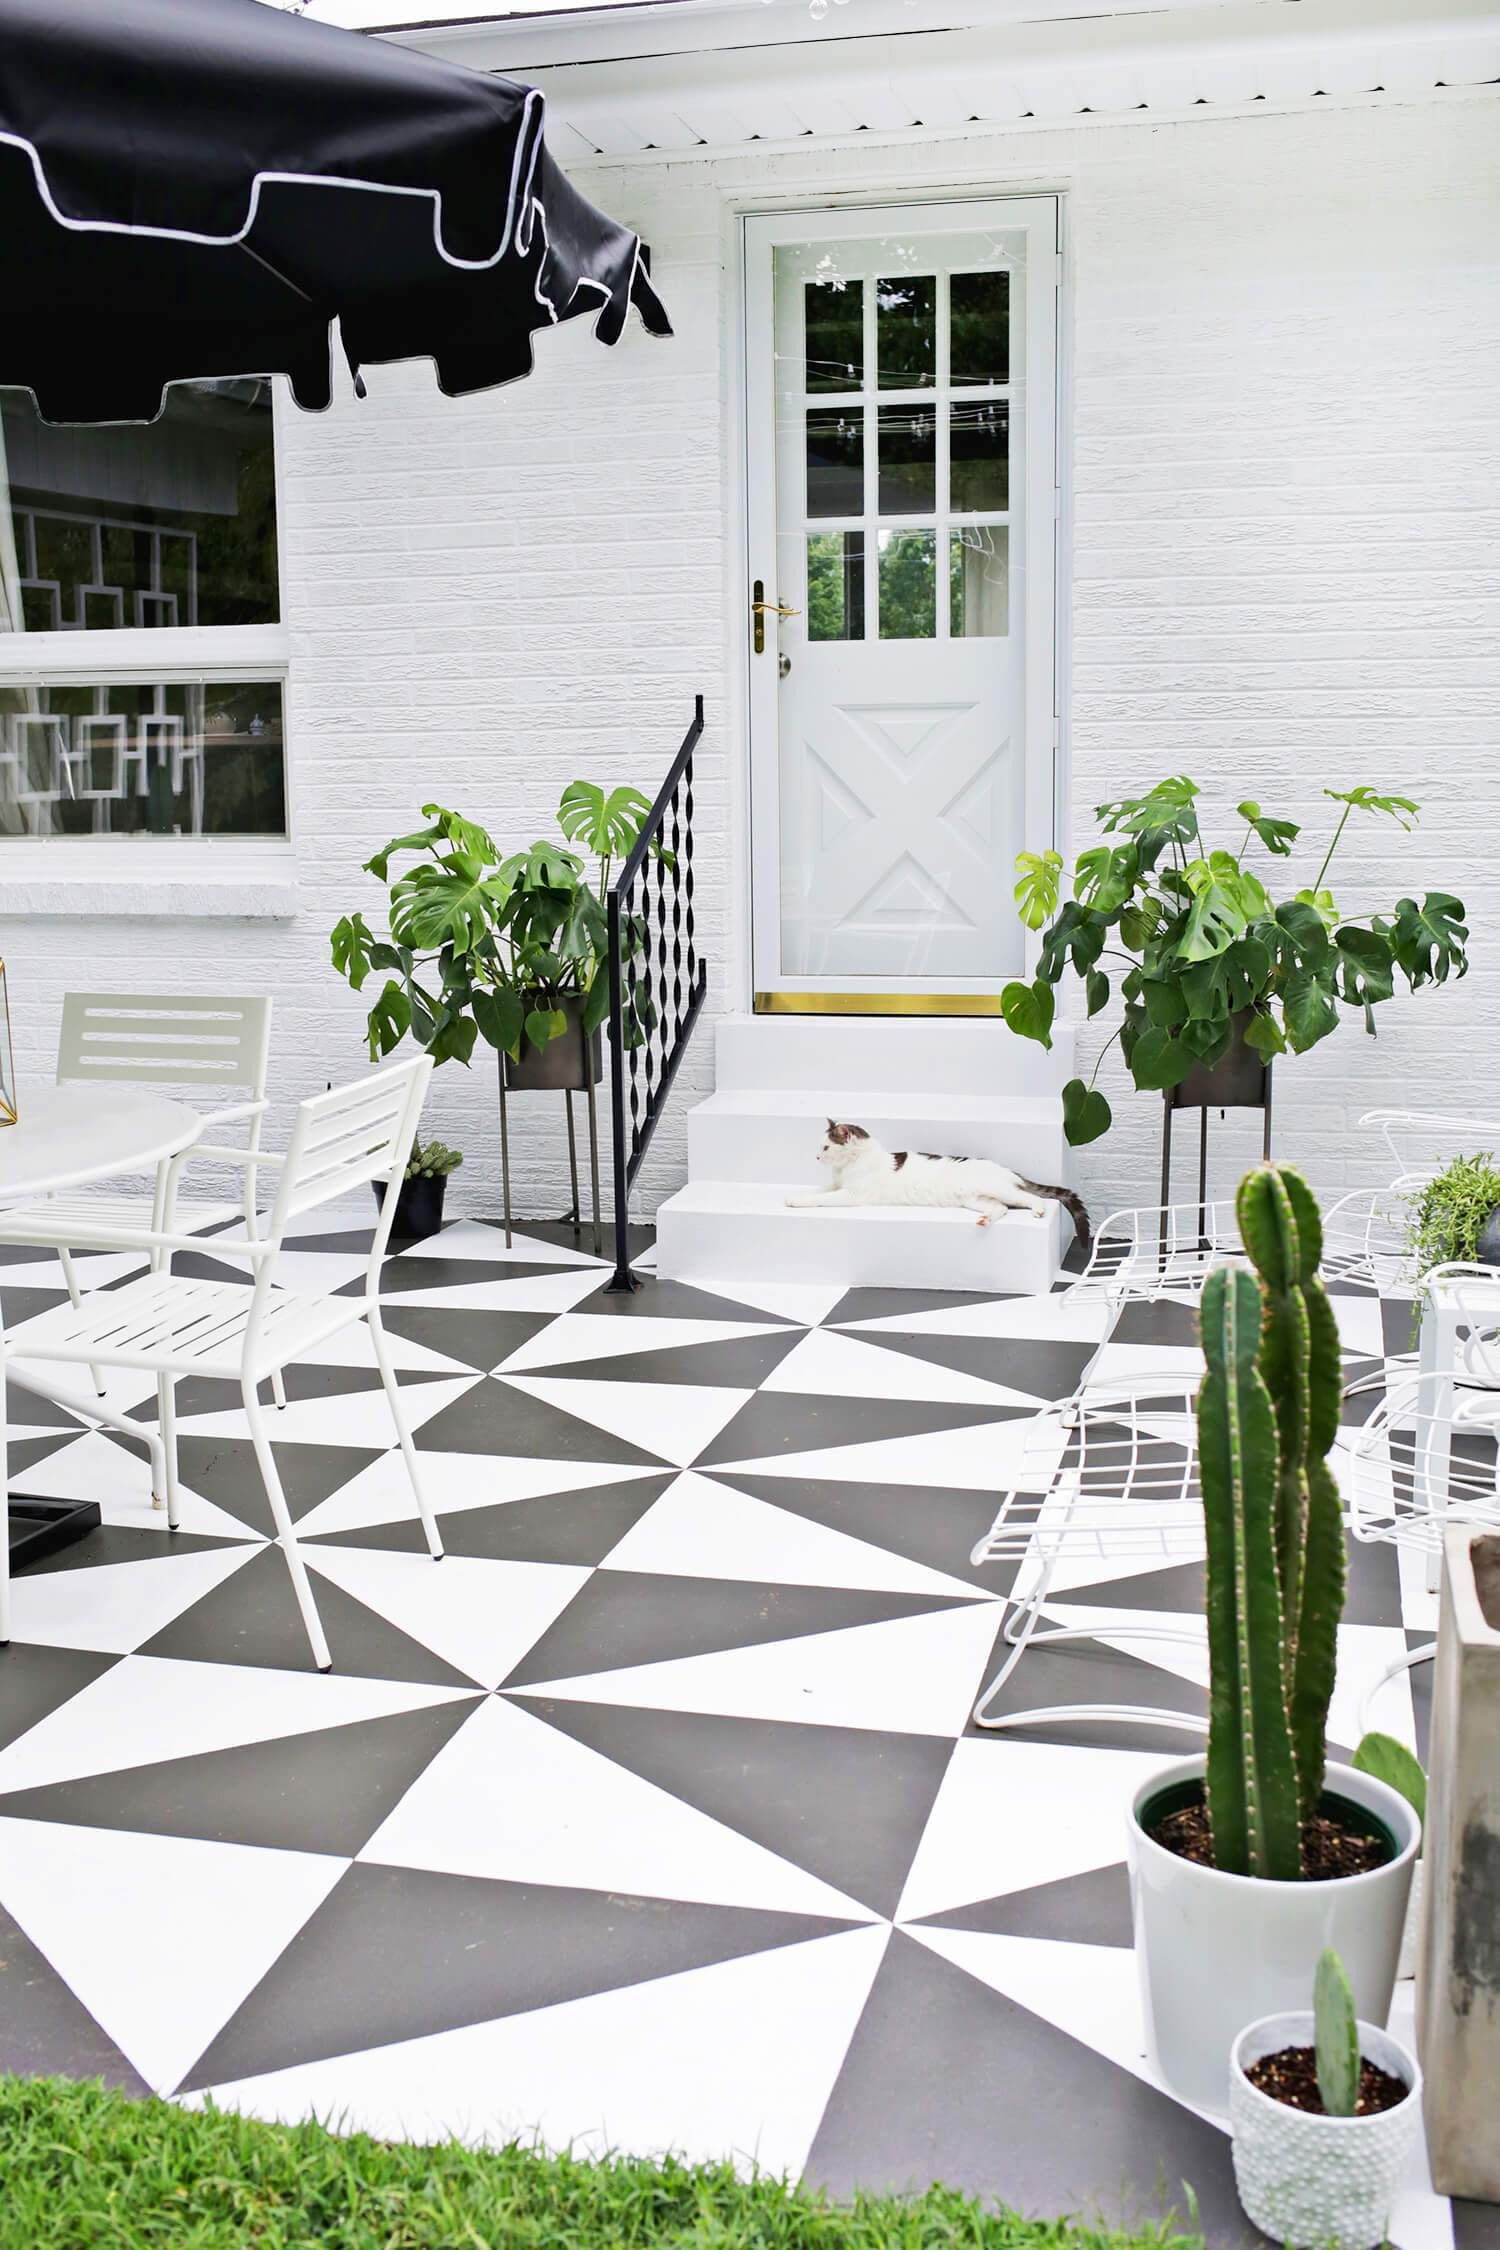 Diy pinta el suelo de tu terraza pintar cemento - Decoracion exteriores terrazas ...